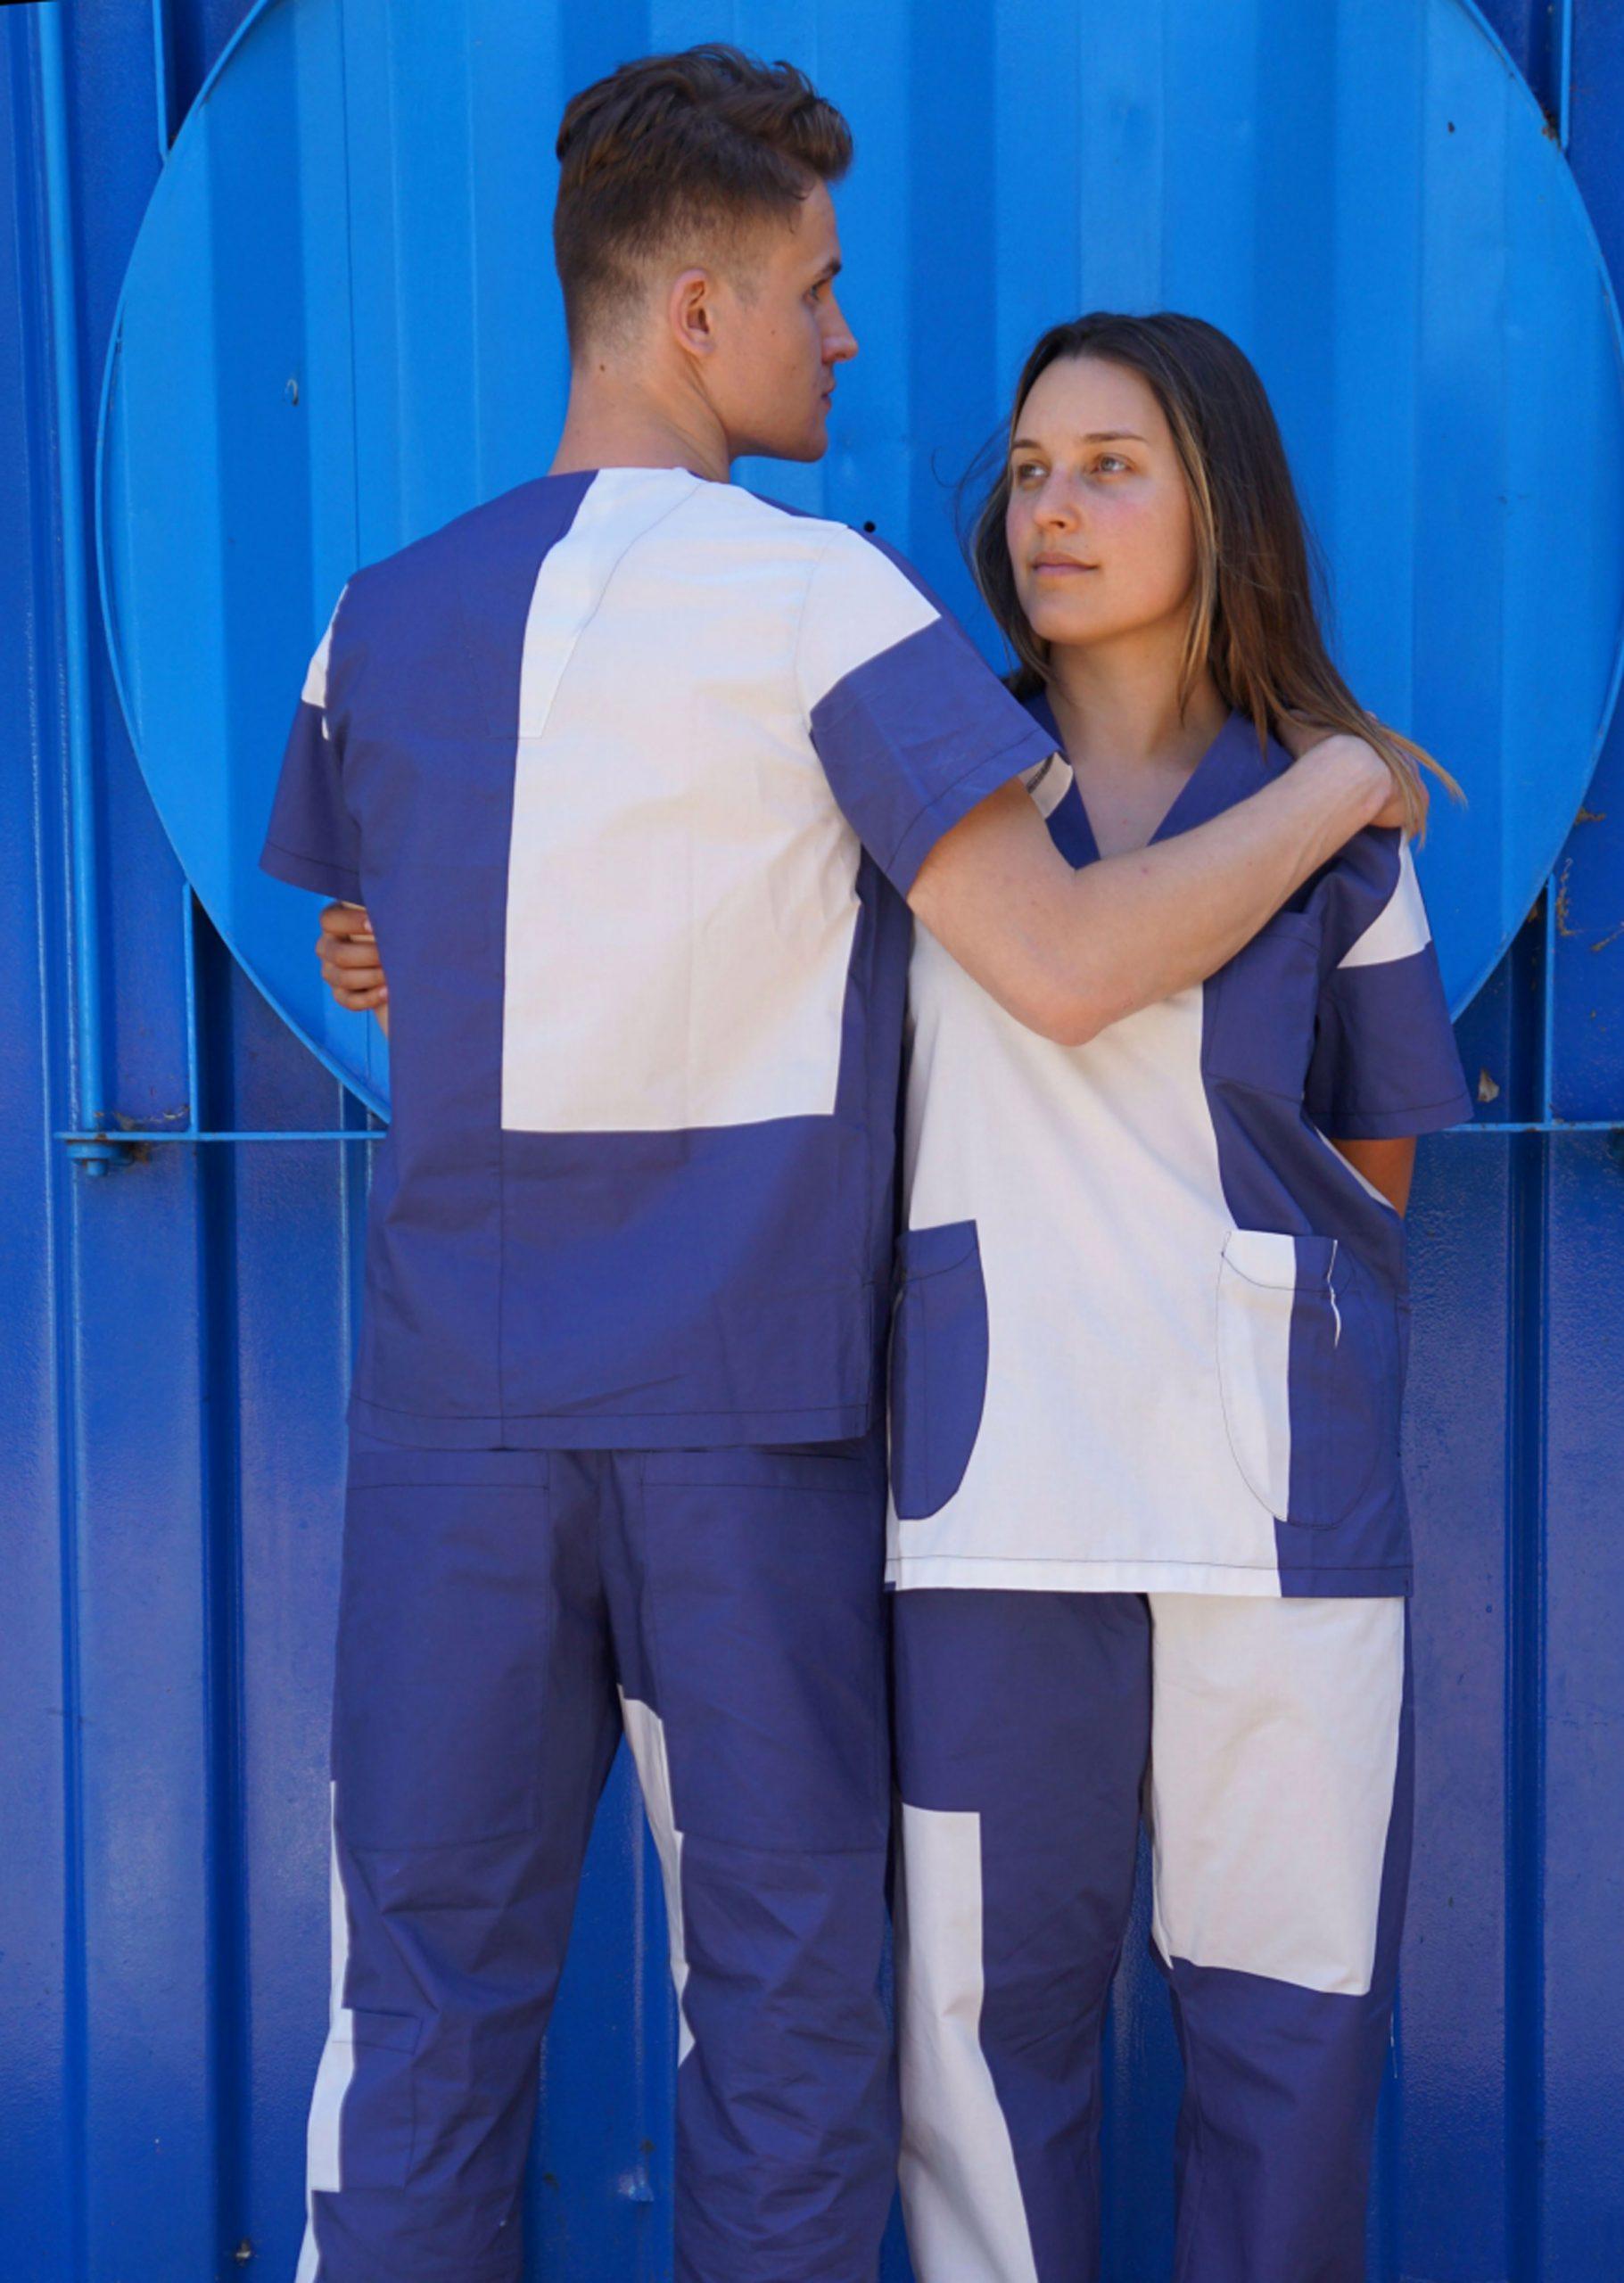 Danielle Elsener develops zero-waste design system to reform fashion industry